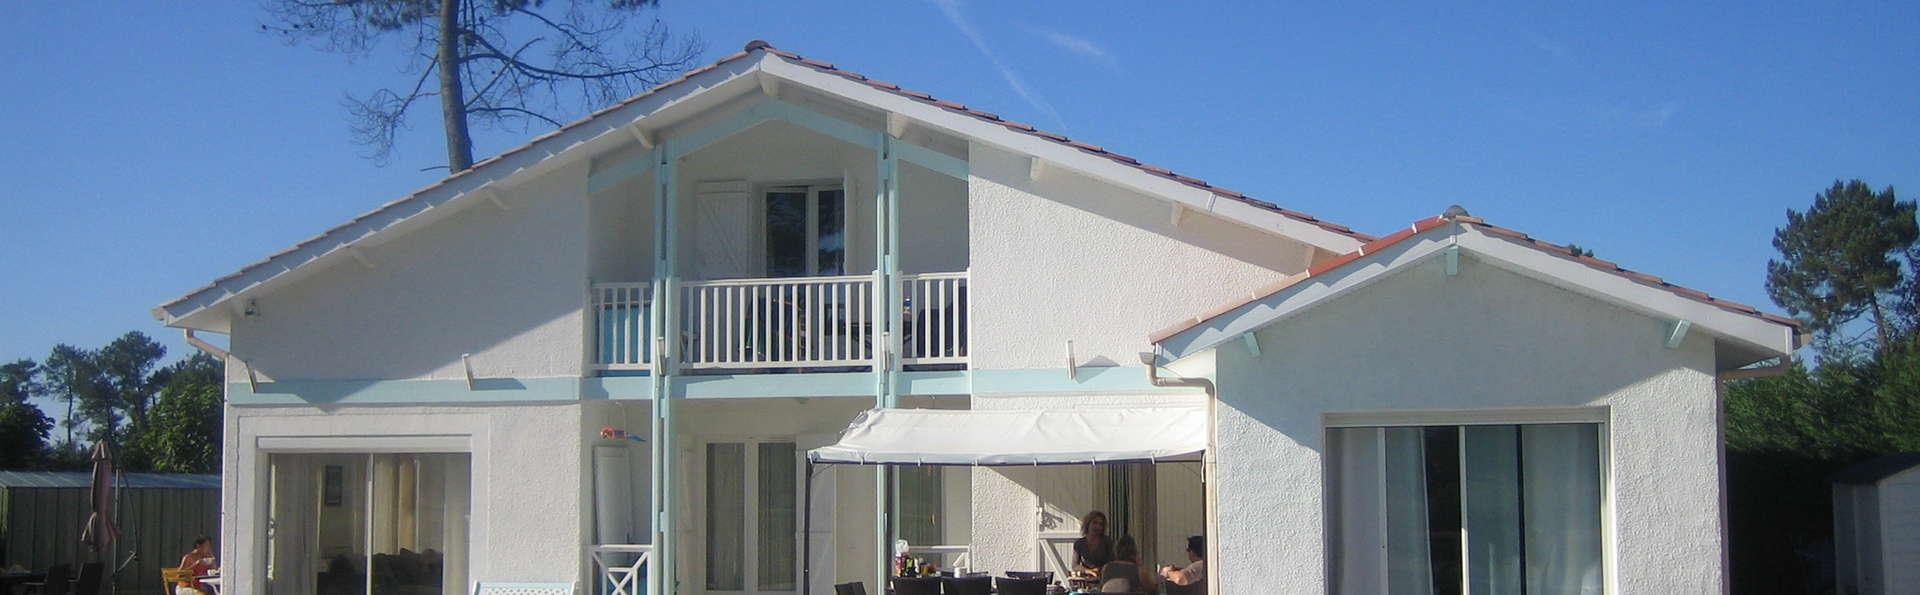 Villa Saint Barth  Ef Bf Bd Gujan Mestras